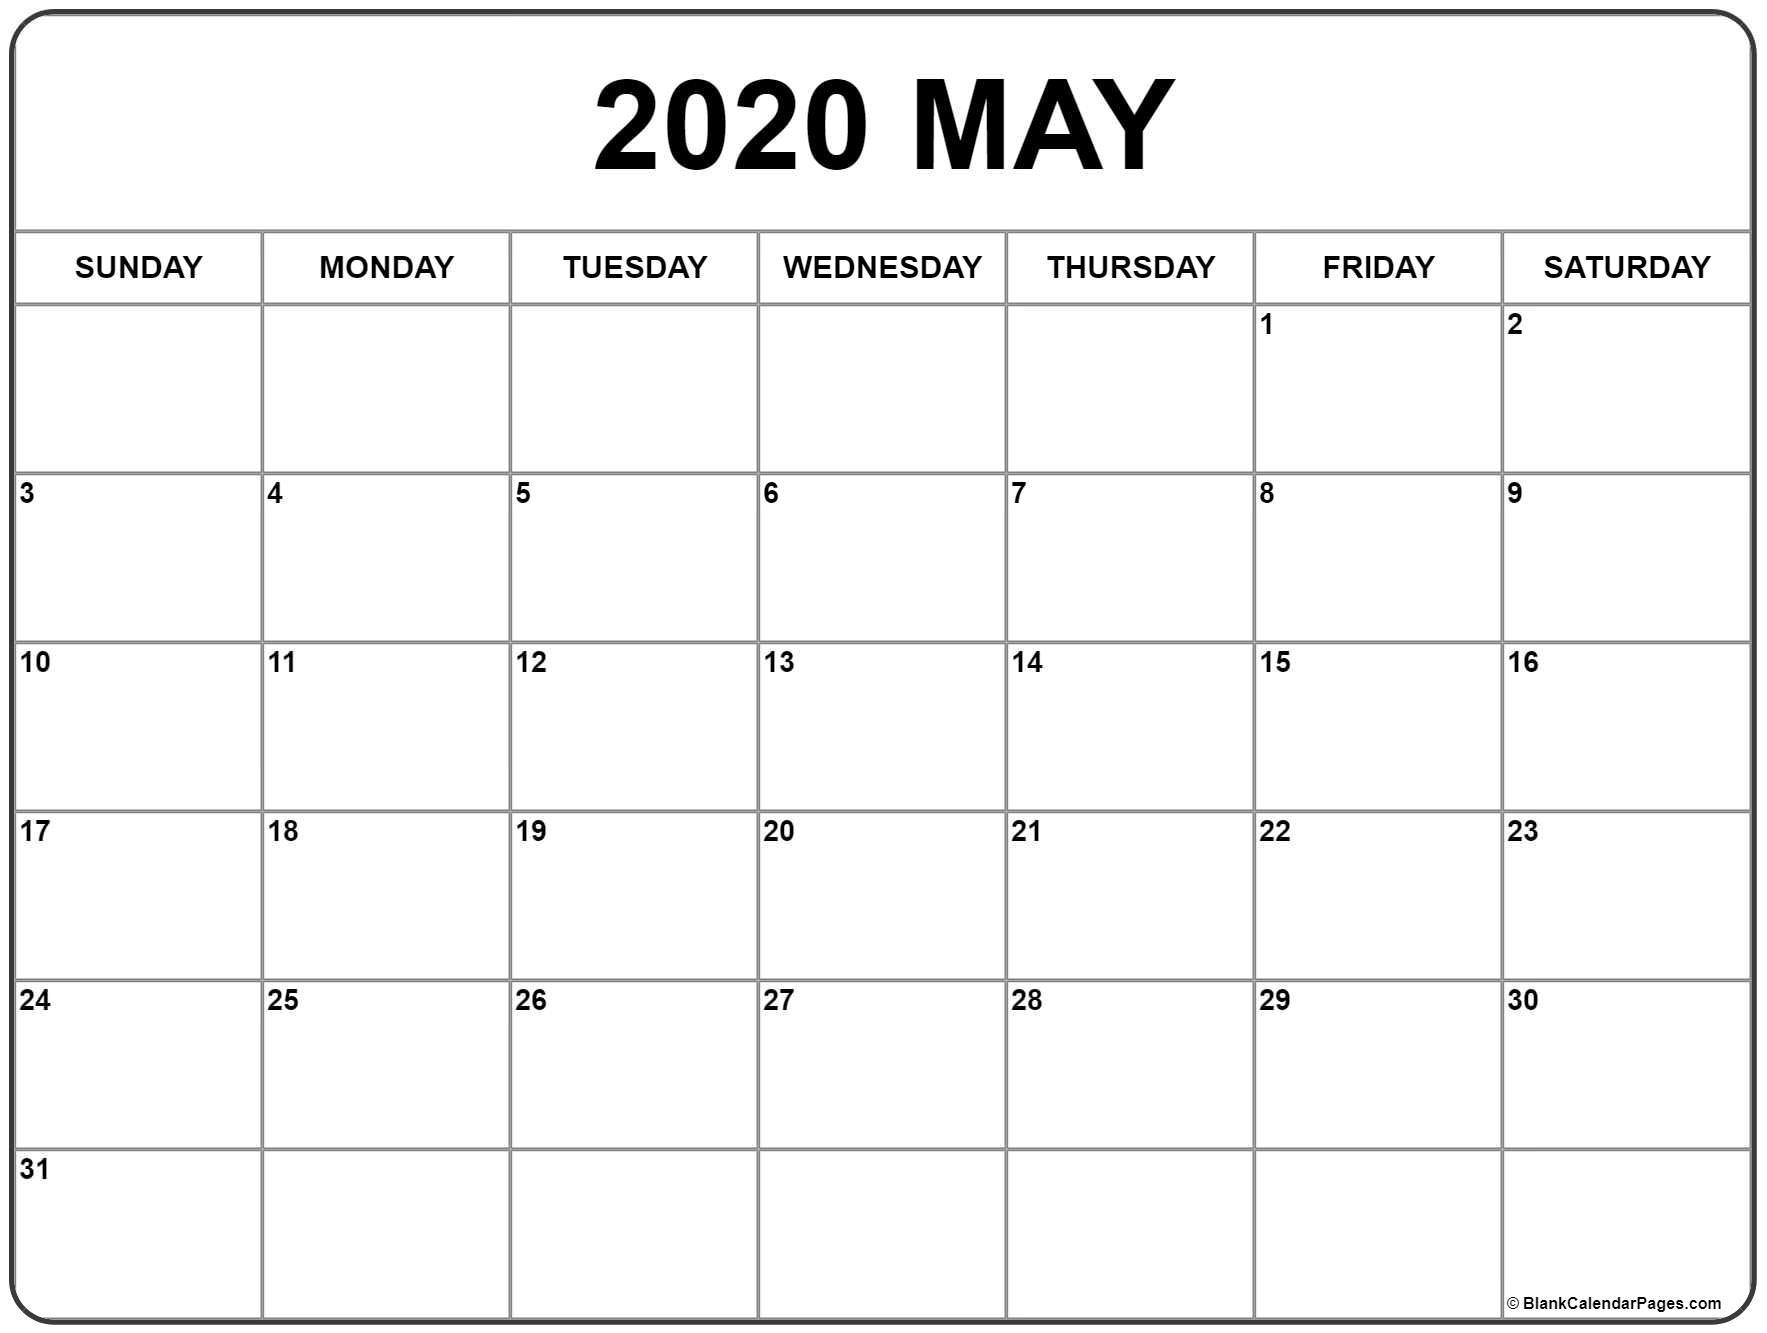 May 2020 Calendar | Free Printable Monthly Calendars  Free Printable Editable Calendars 2020